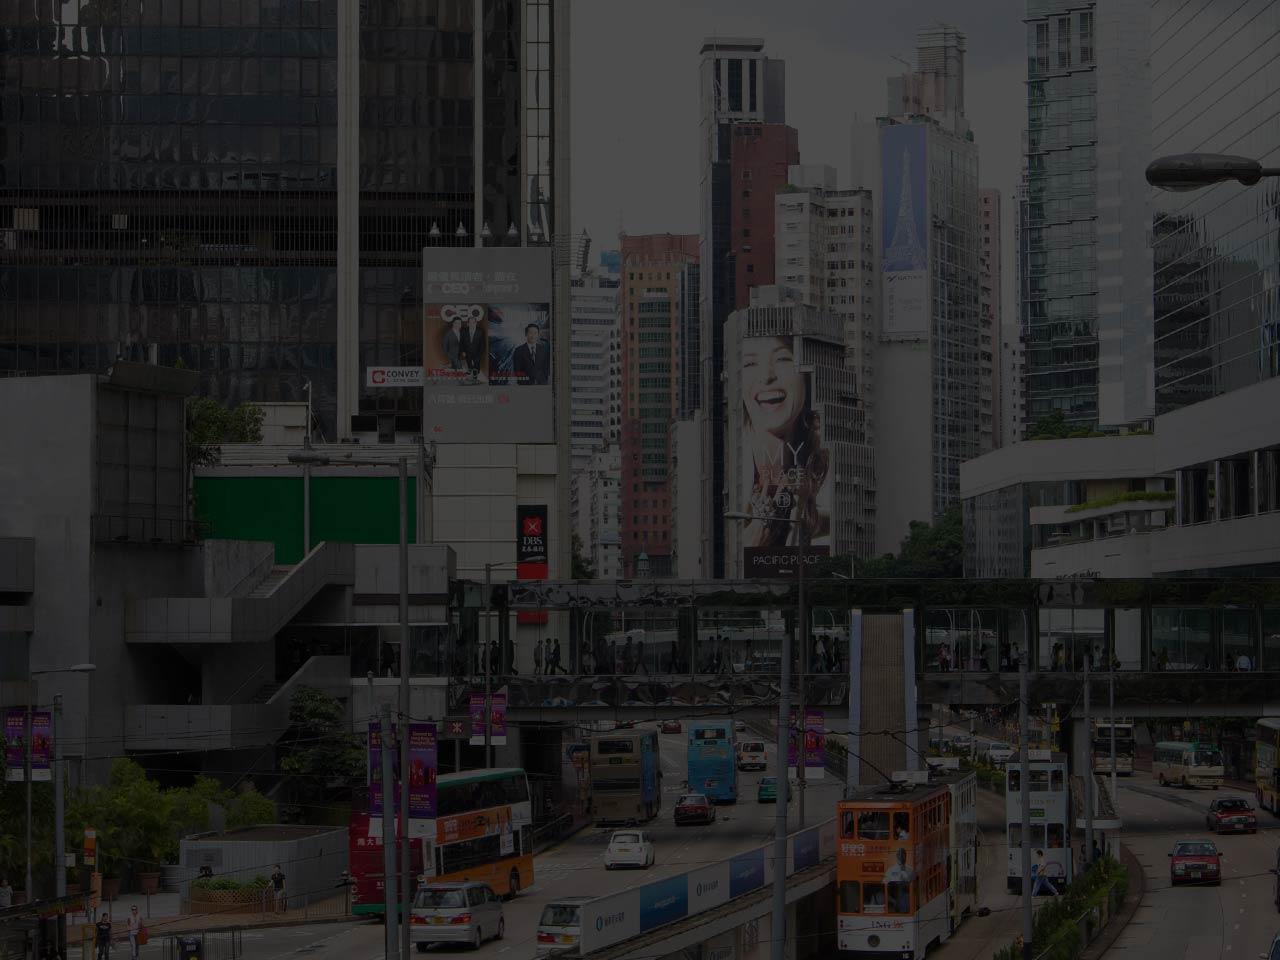 Werbung in Hongkong, dunkel